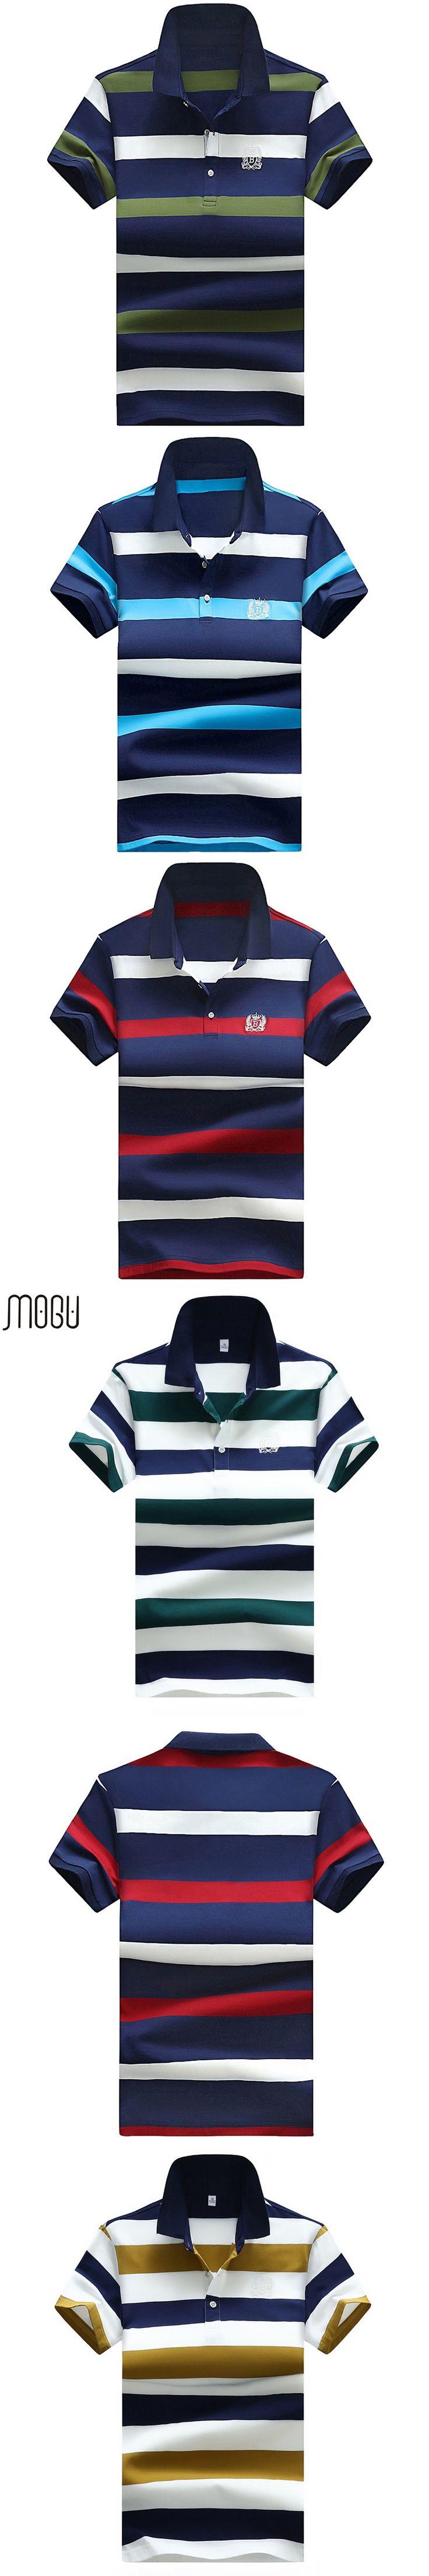 MOGU Short Sleeve Polo Shirt Men 2017 Summer New Fashion Stripe Polo Shirt Men High Quality Polo Asian Size 4XL Men's Polo Shirt